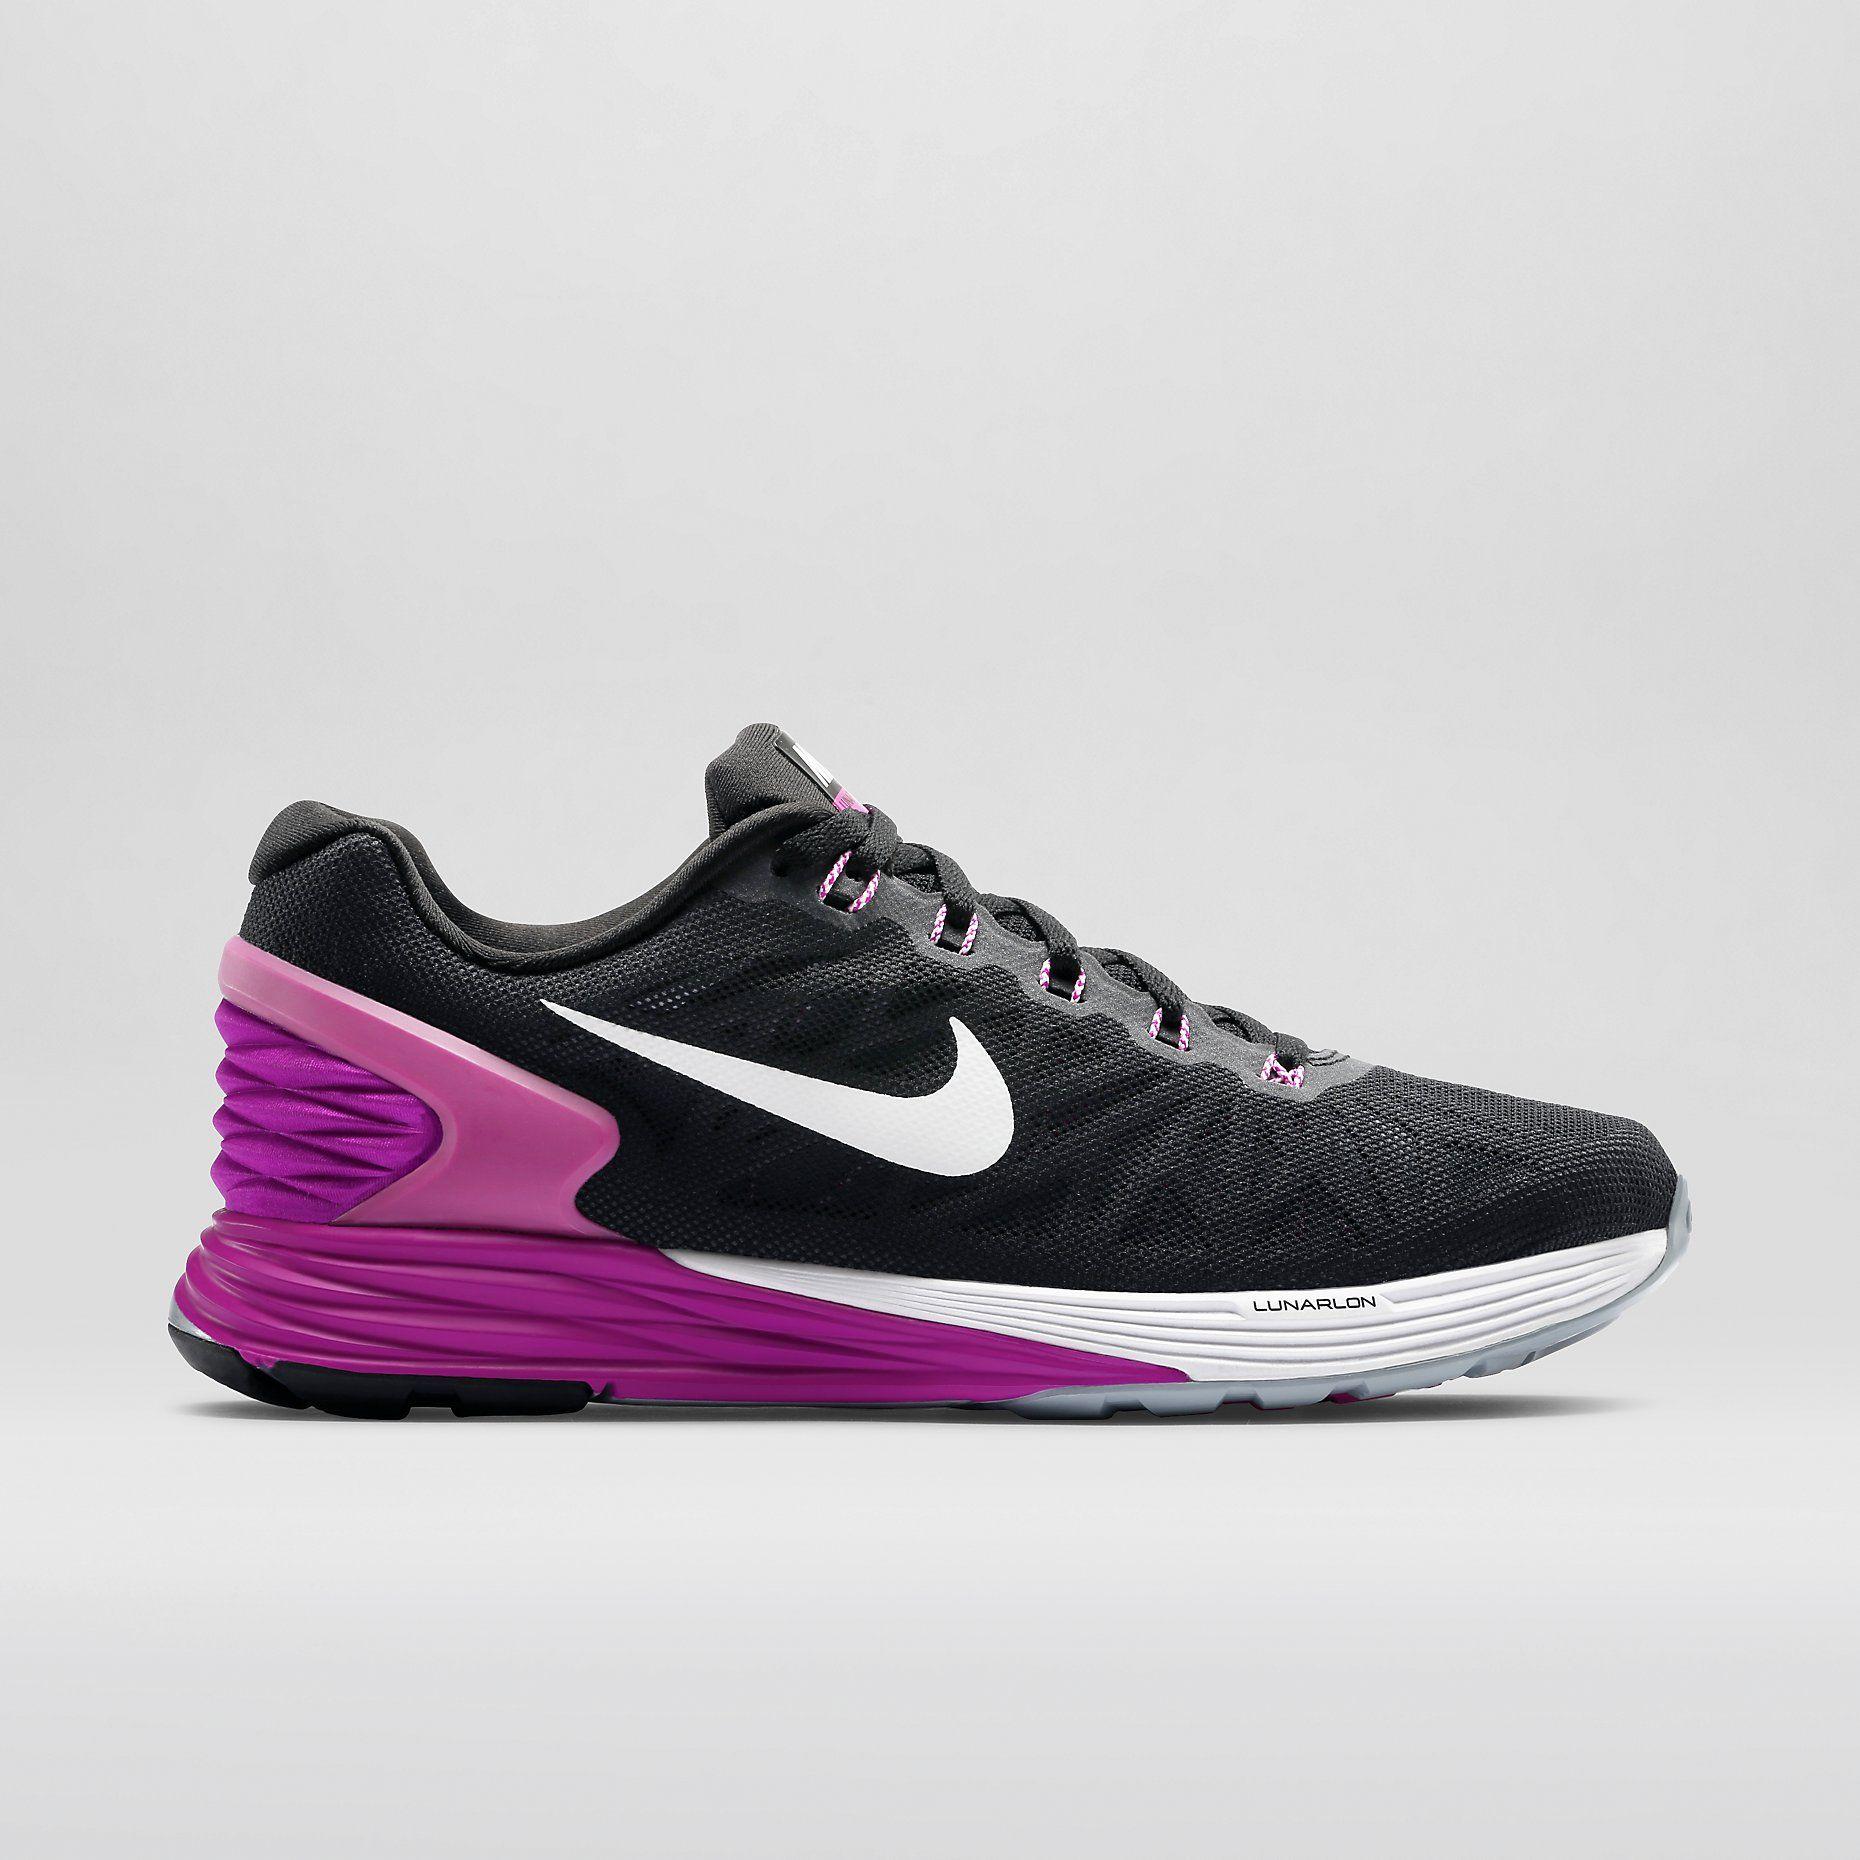 7dd72c3bc786 Nike LunarGlide 6 Women s Running Shoe. Nike Store UK